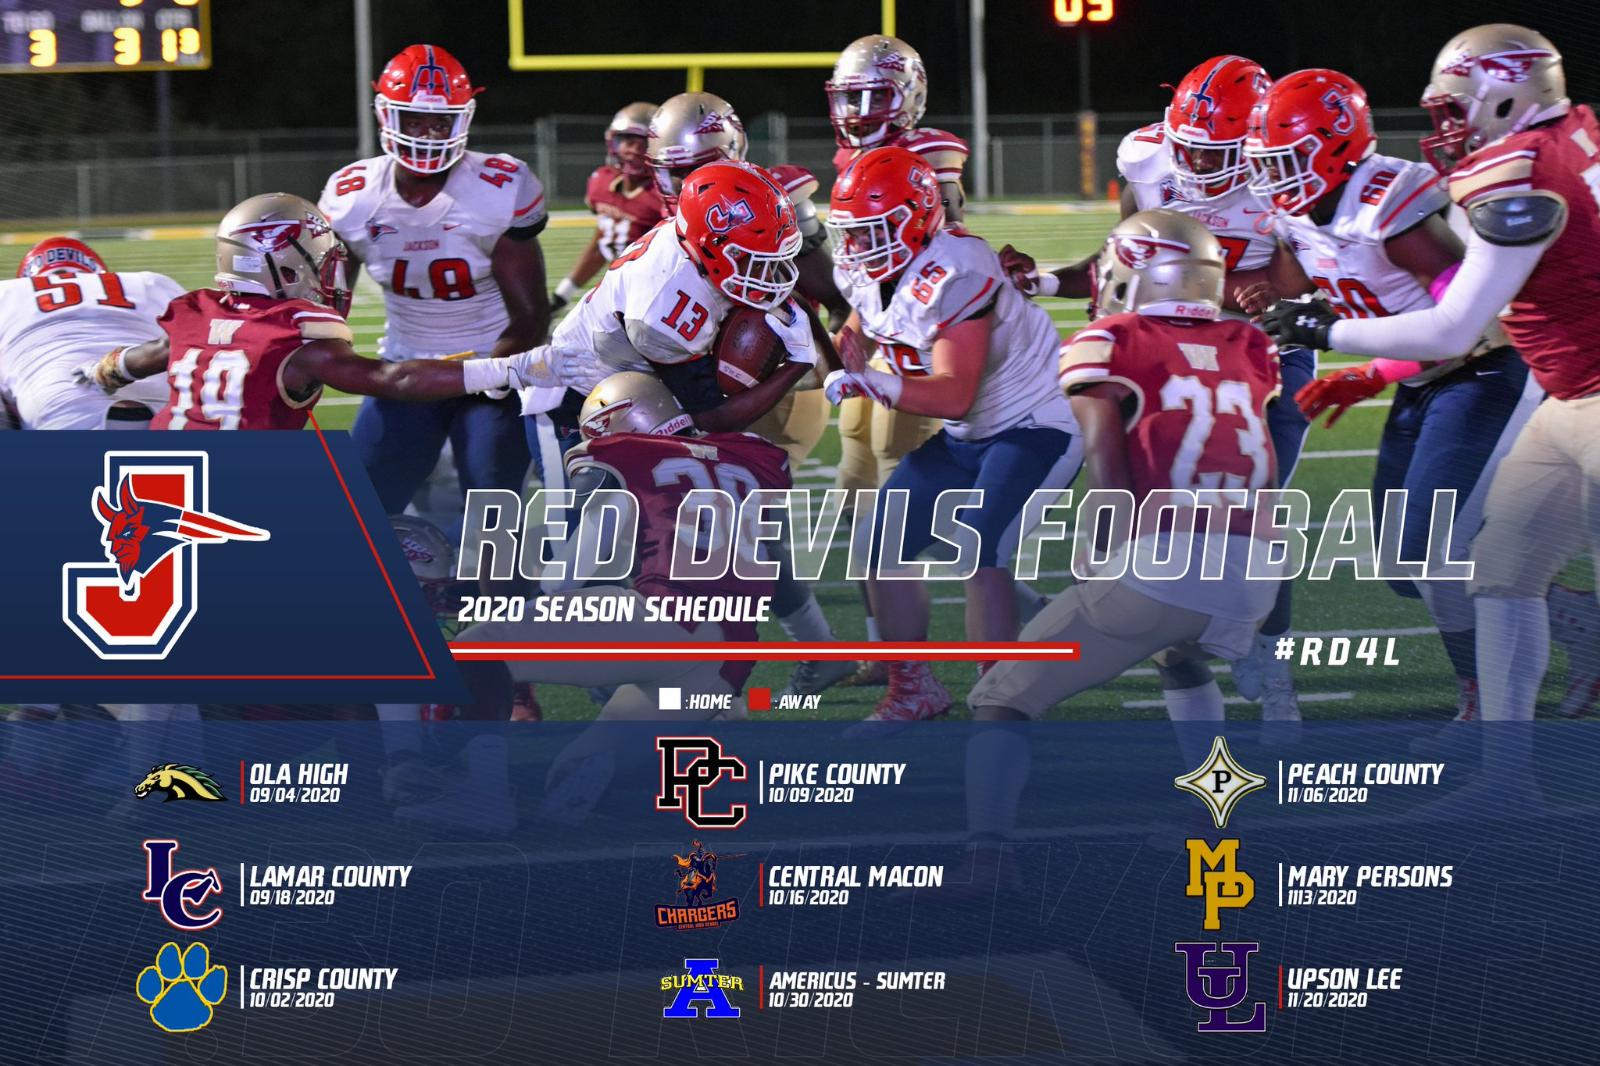 2020 Red Devils Football Scheduled